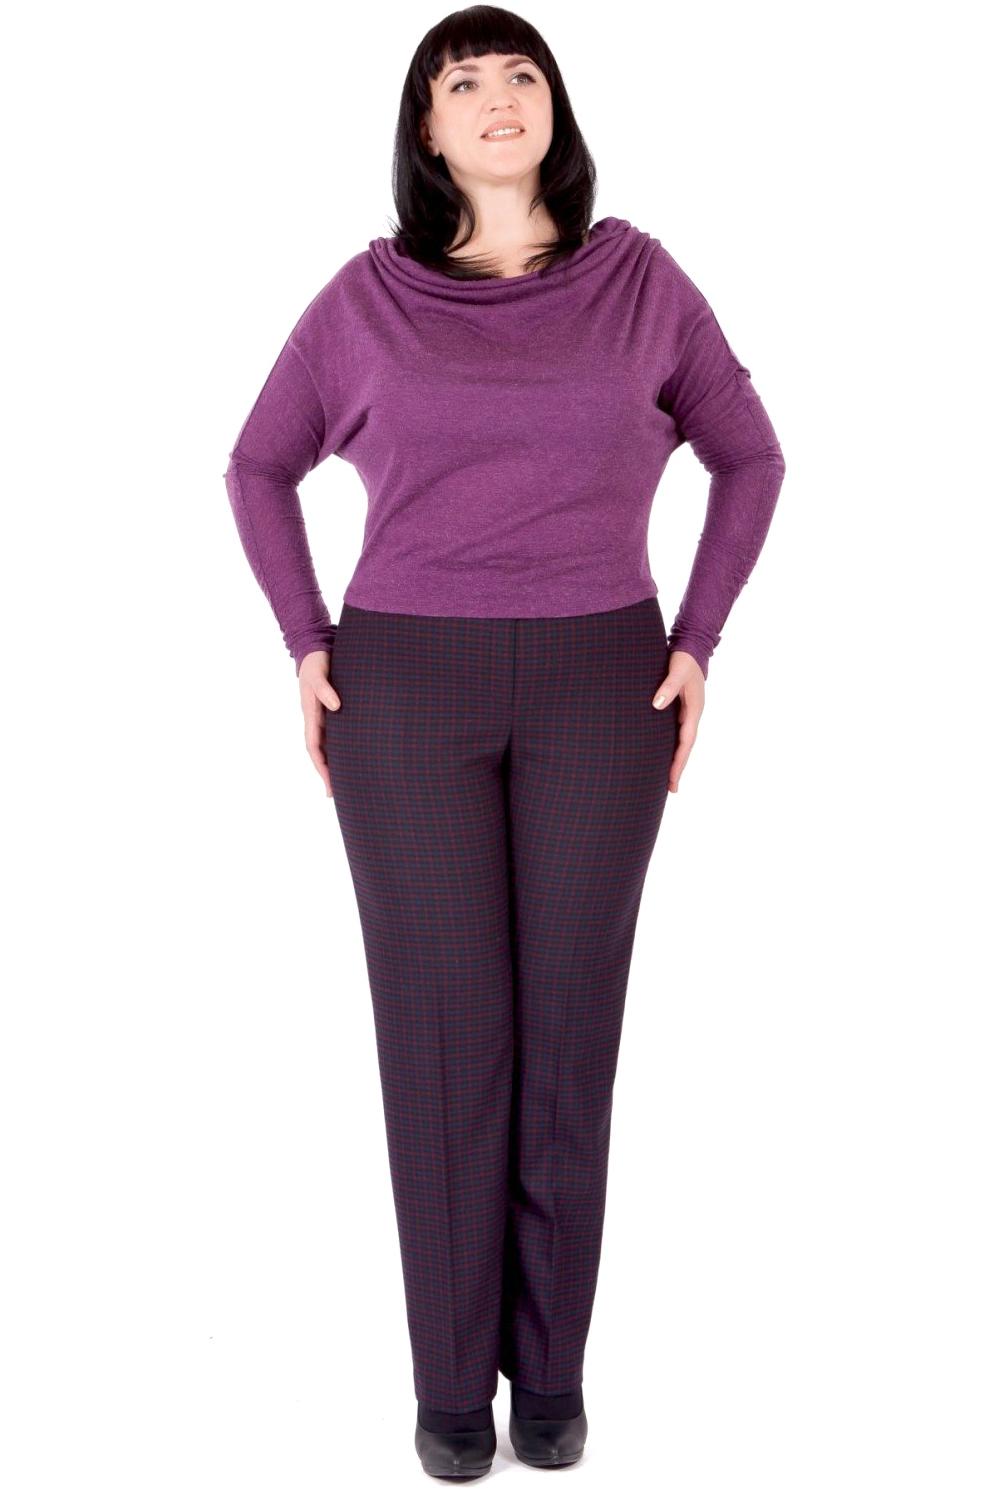 брюки женские 50 размера фото